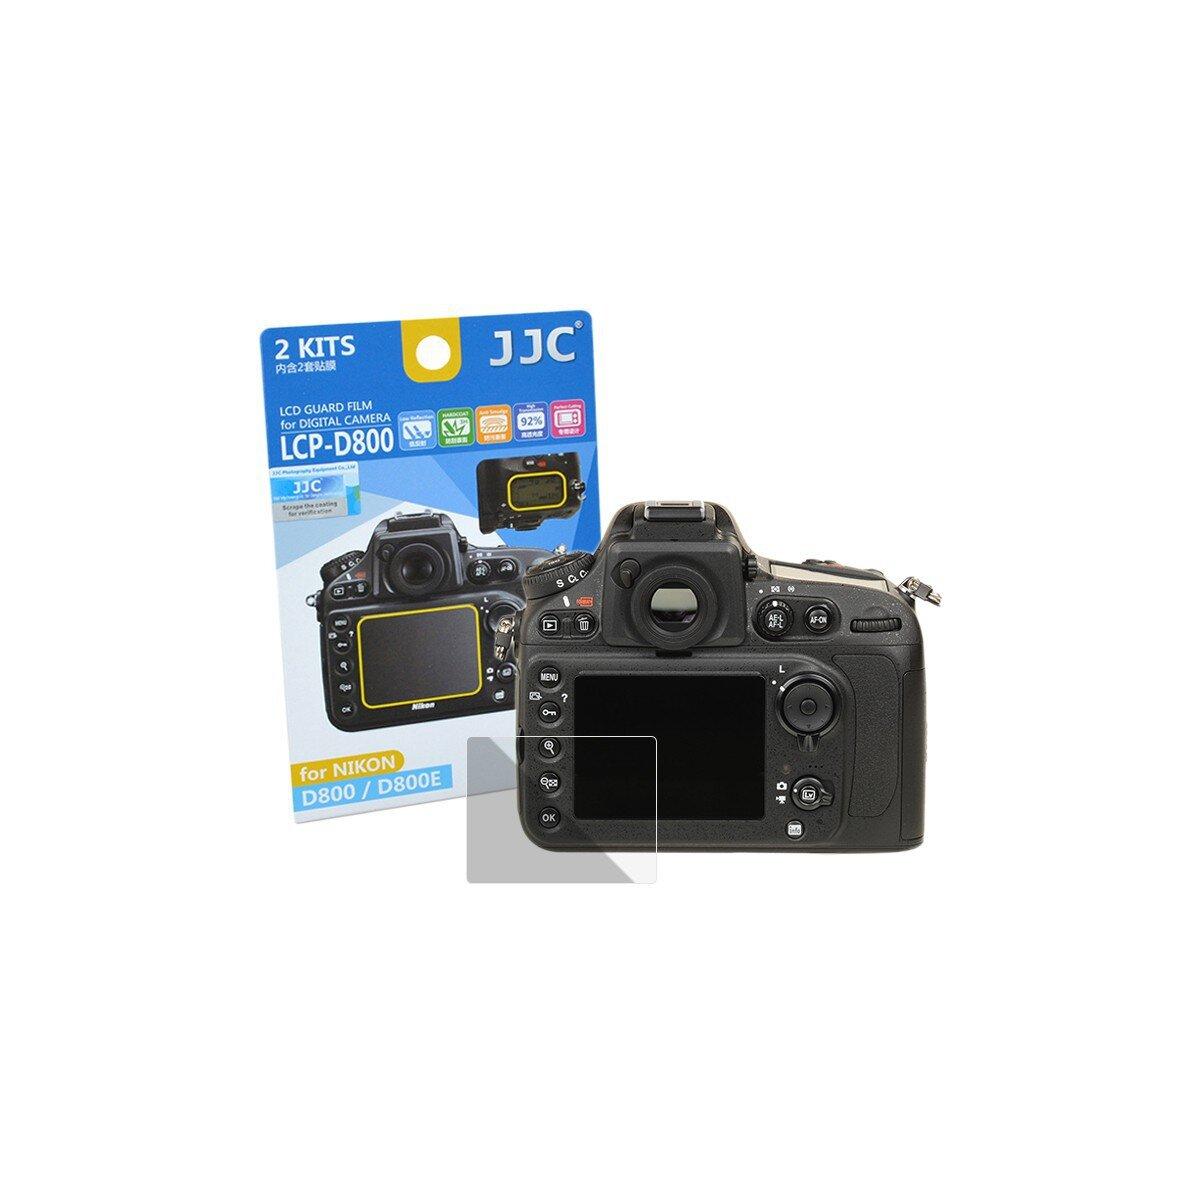 JJC Displayschutzfolie Screen Protector Kratzschutz passgenau kompatibel mit Nikon D800, D800E - LCP-D800